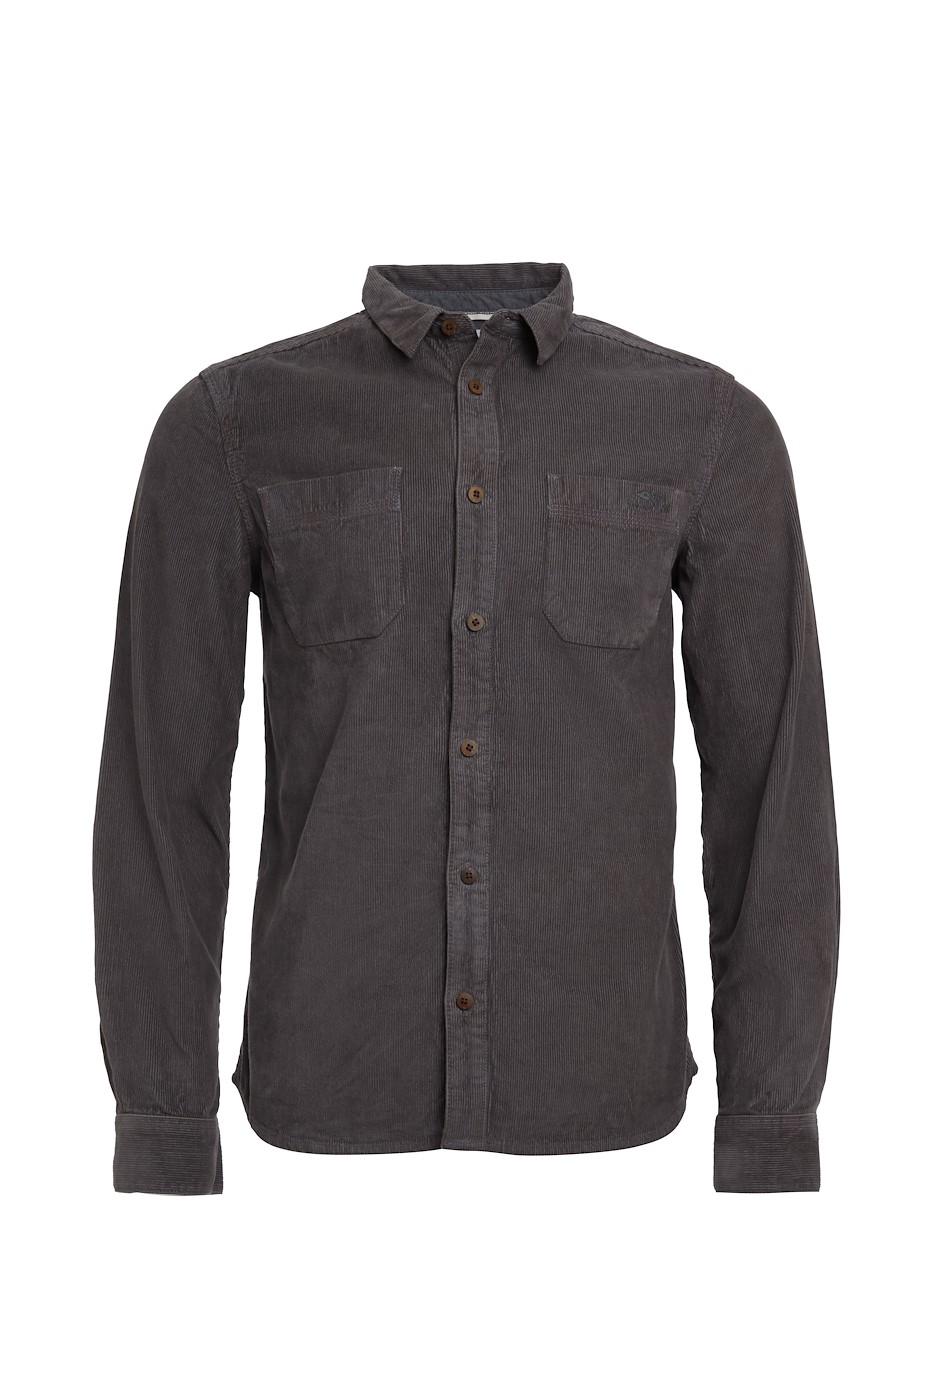 Leonard Long Sleeve Cord Shirt Coal